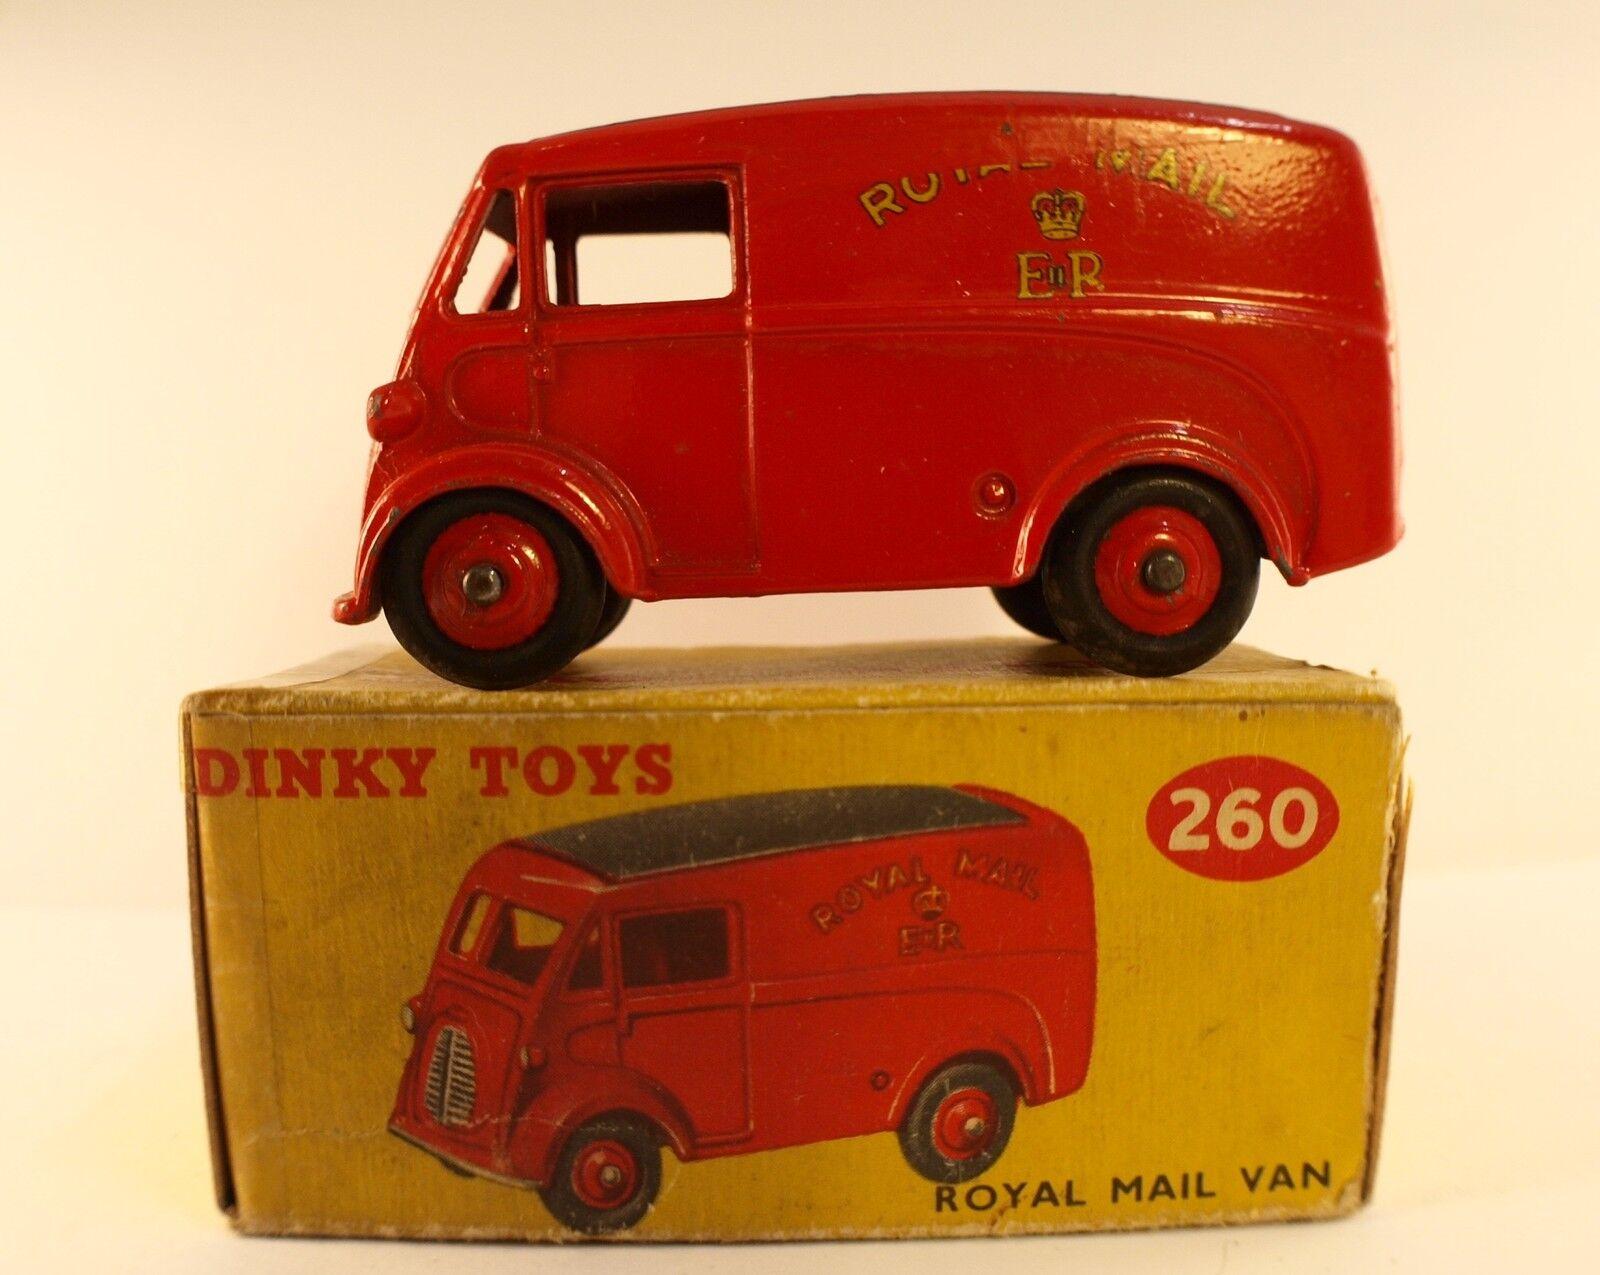 Dinky toys gb no. 260 morris royal mail van in box